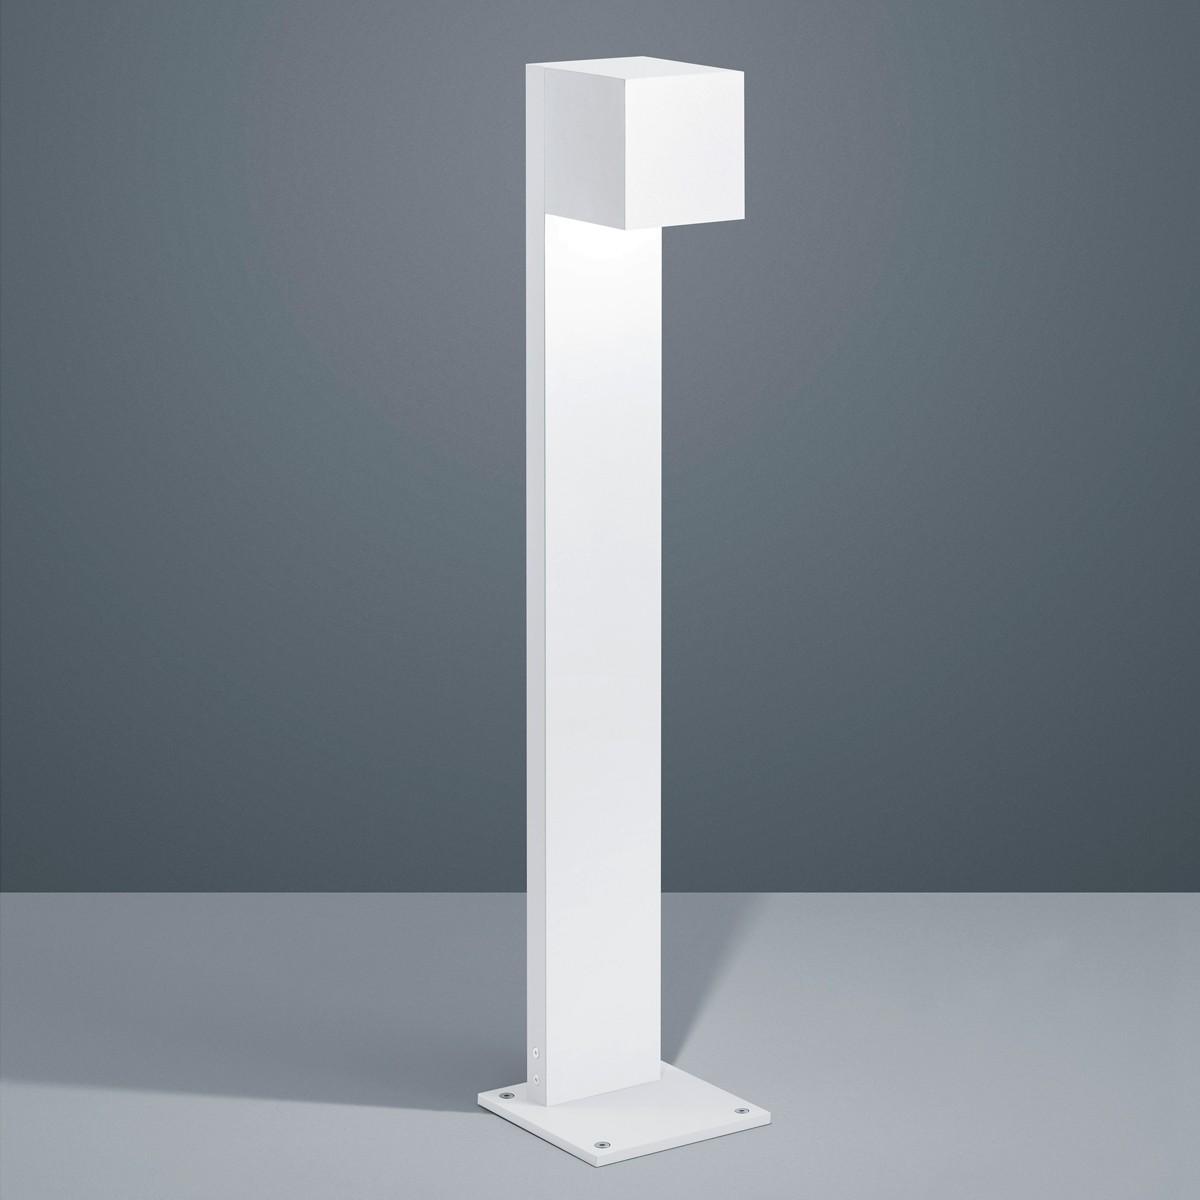 Helestra Siri 44 LED Pollerleuchte, weiß matt